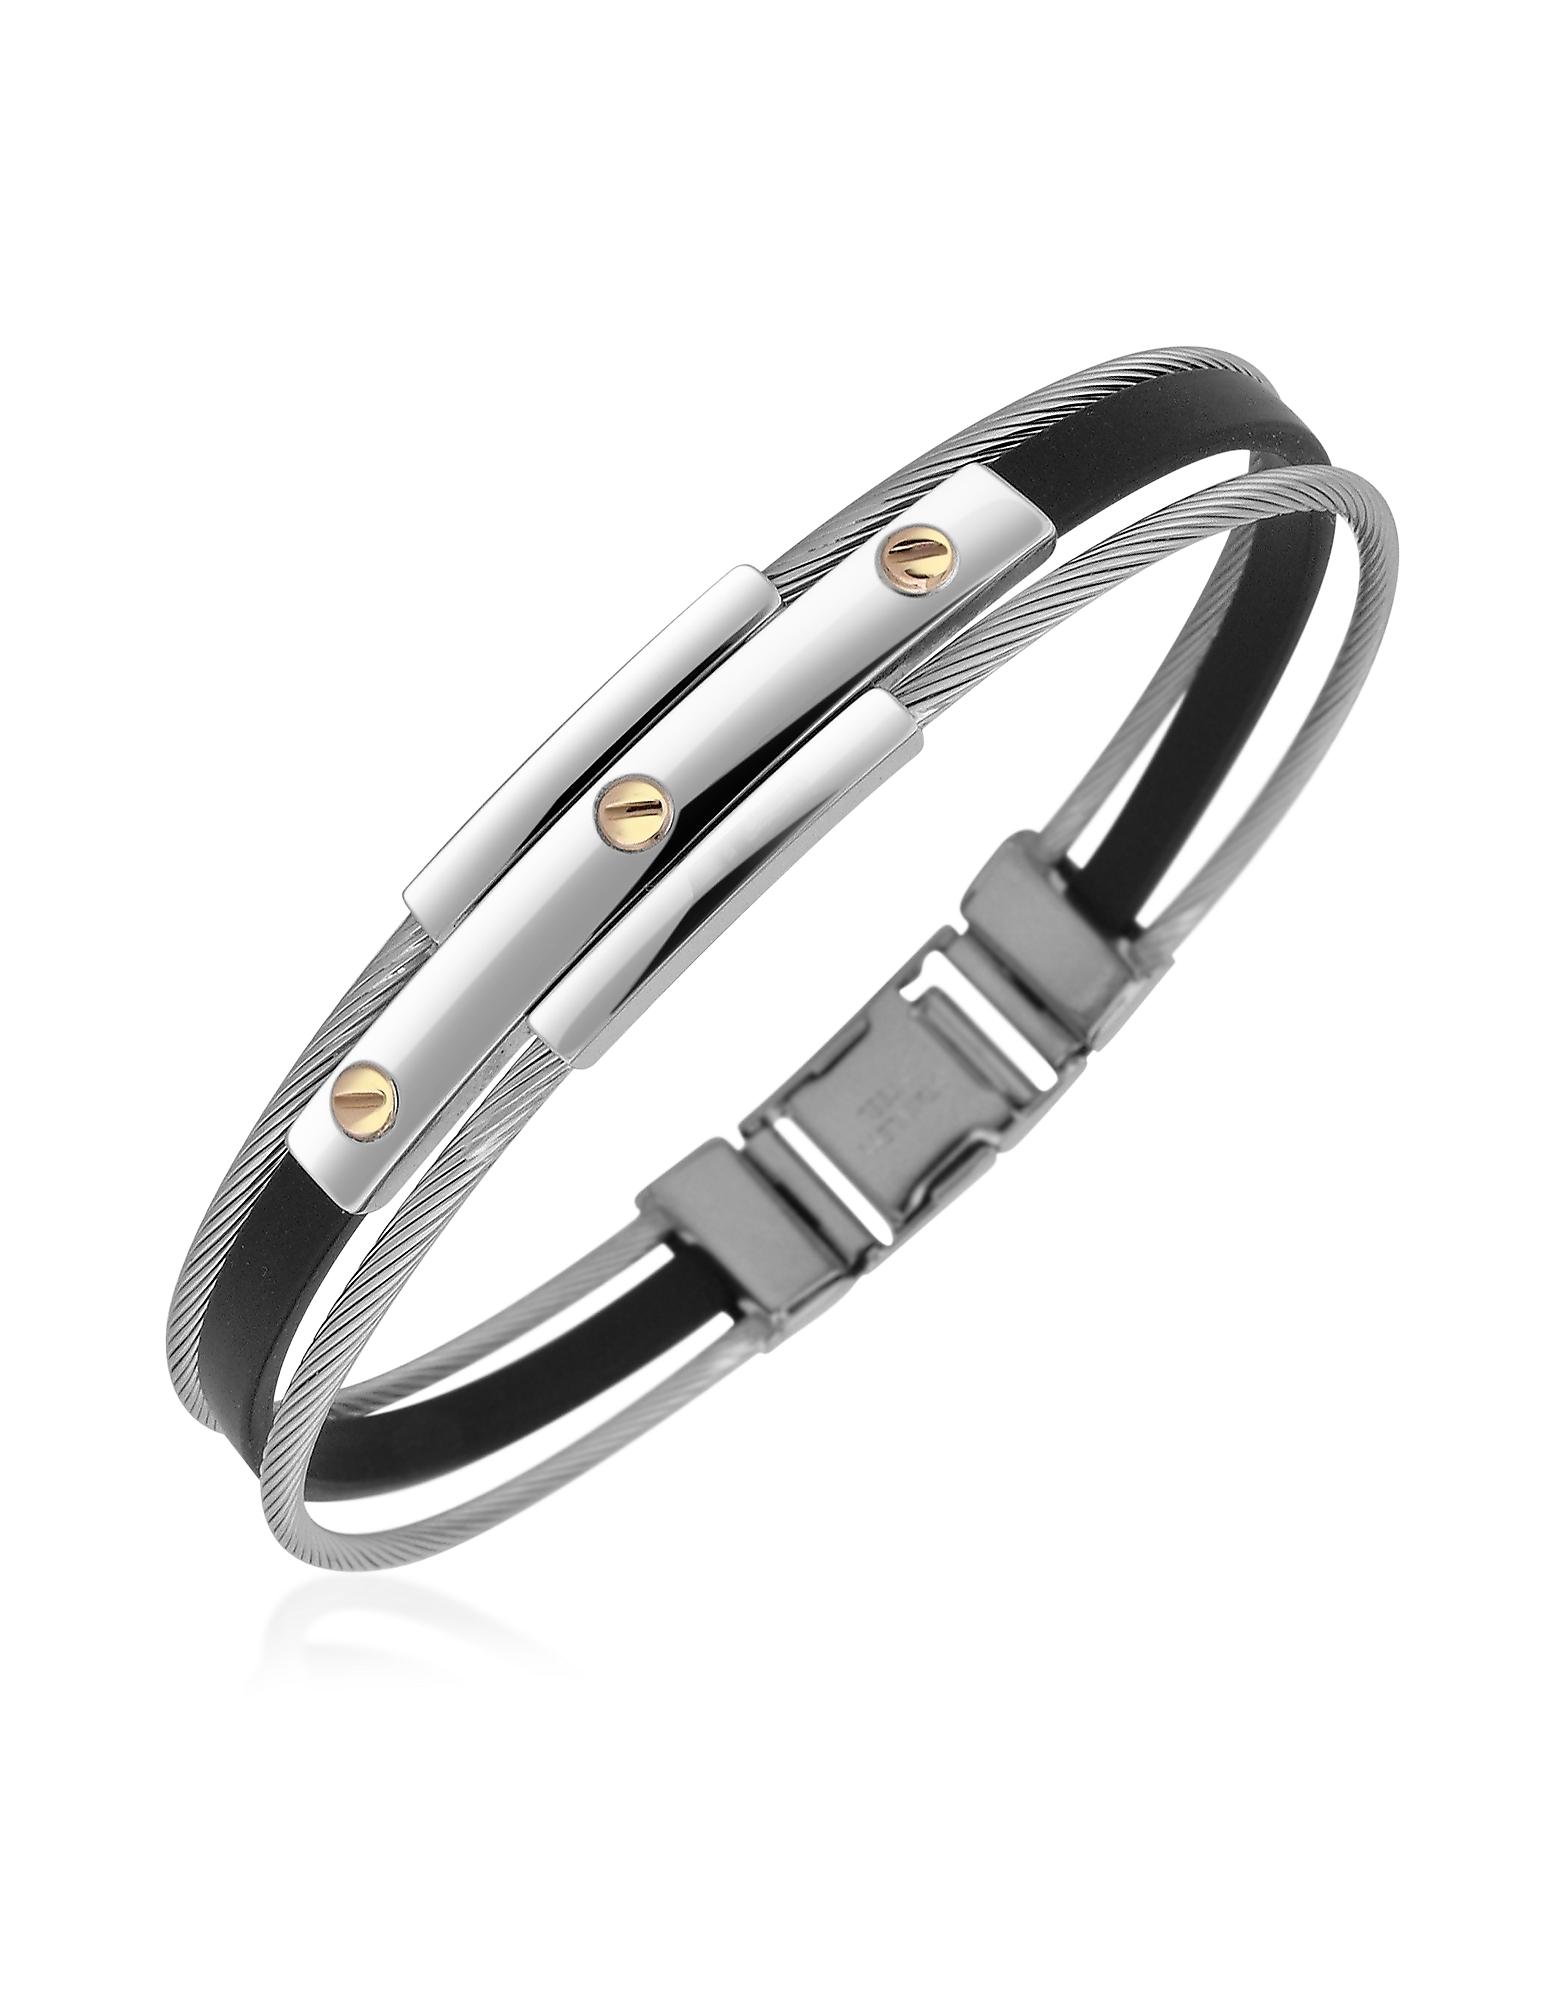 Forzieri Bracelets, Men's Stainless Steel and Rubber Screws Bracelet